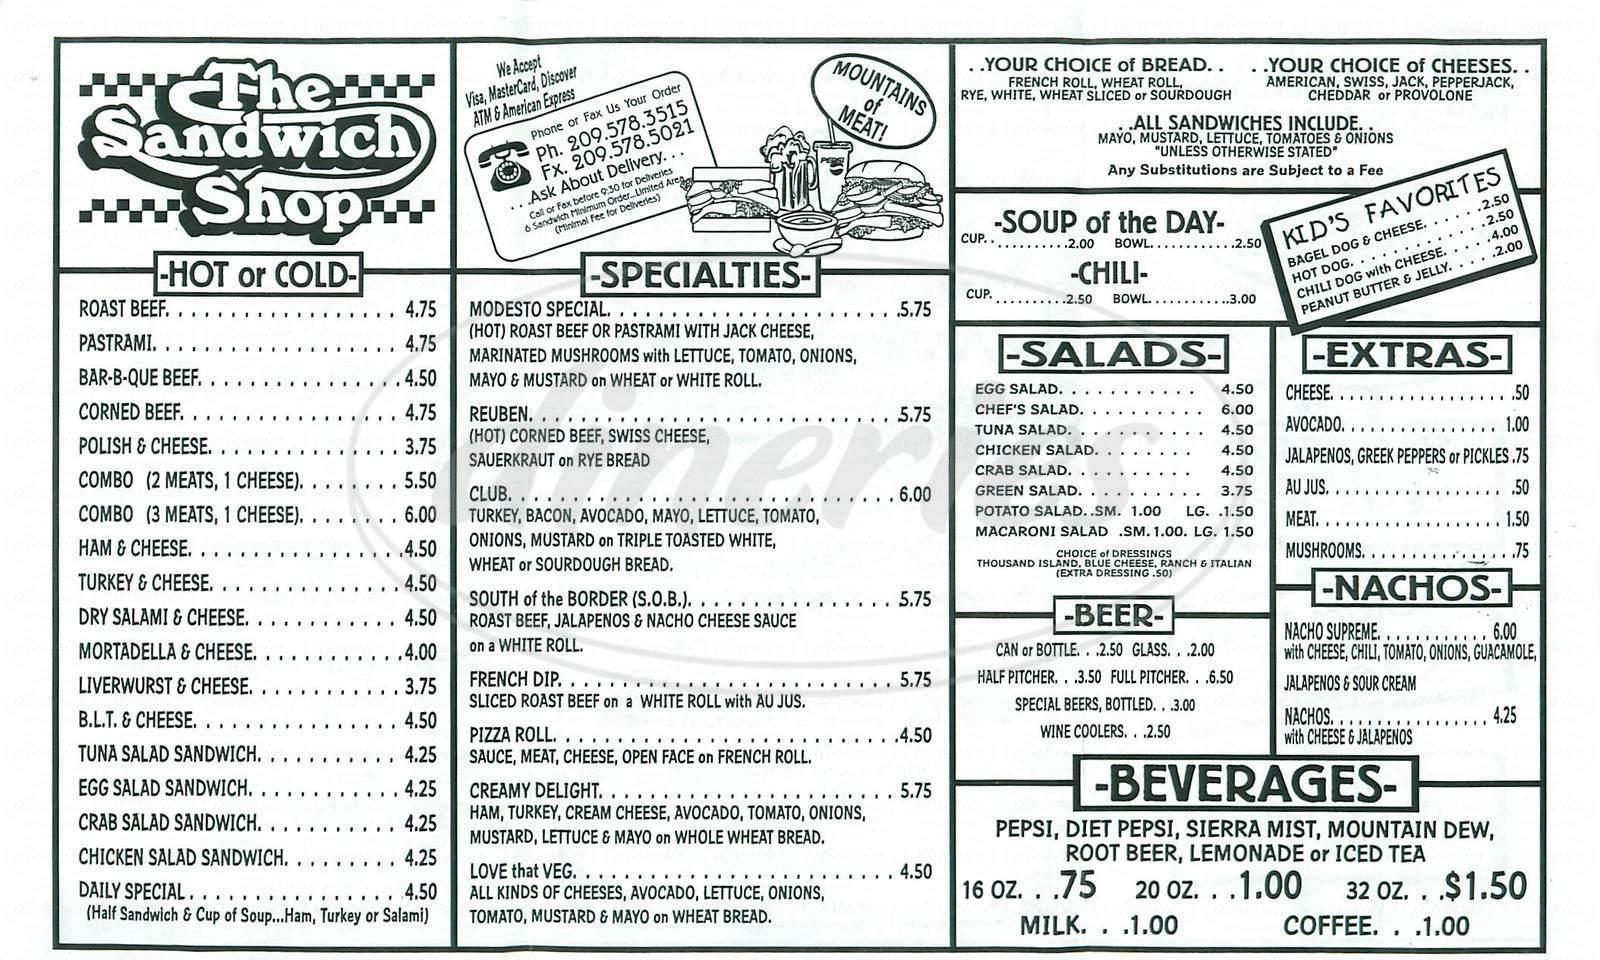 Big menu for The Sandwich Shop, Modesto